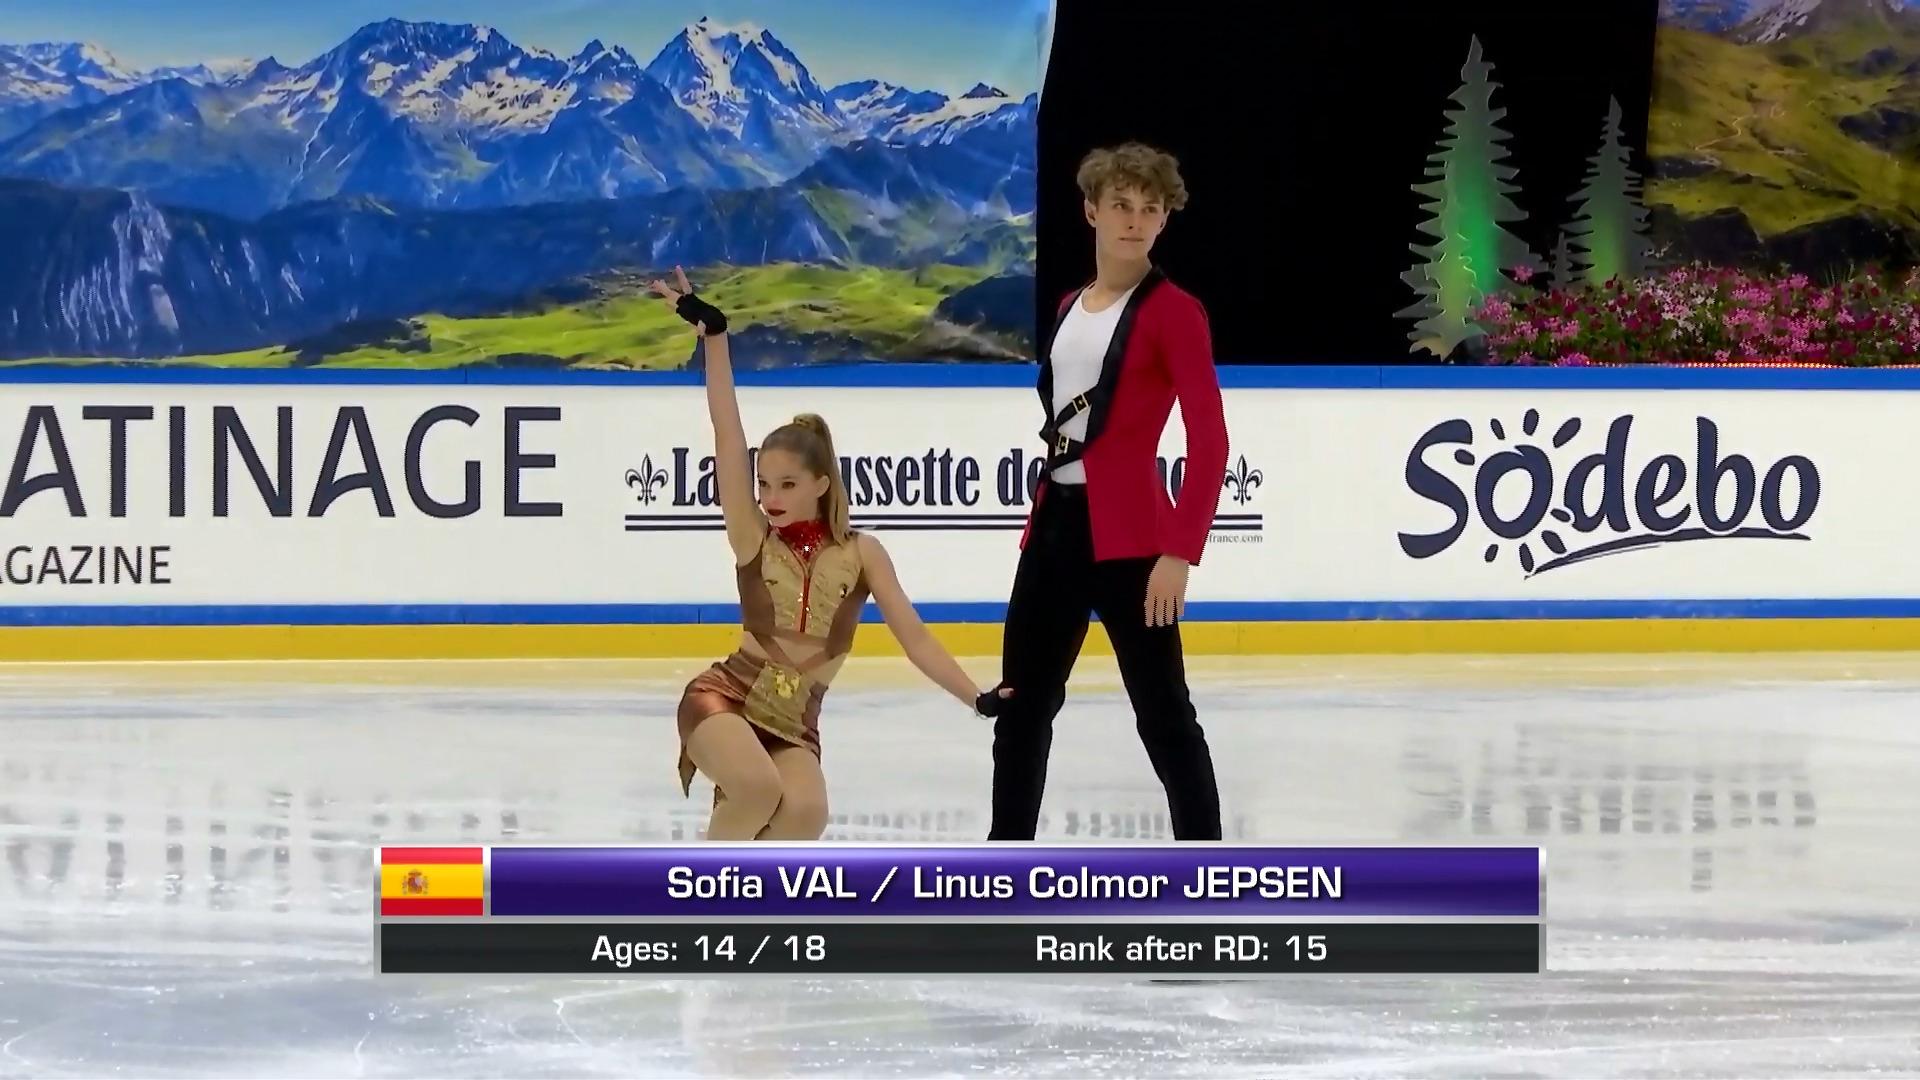 2019 ISU JGP Courchevel - Ice Dance Free Dance.mp4_snapshot_00.36.42.368.jpg